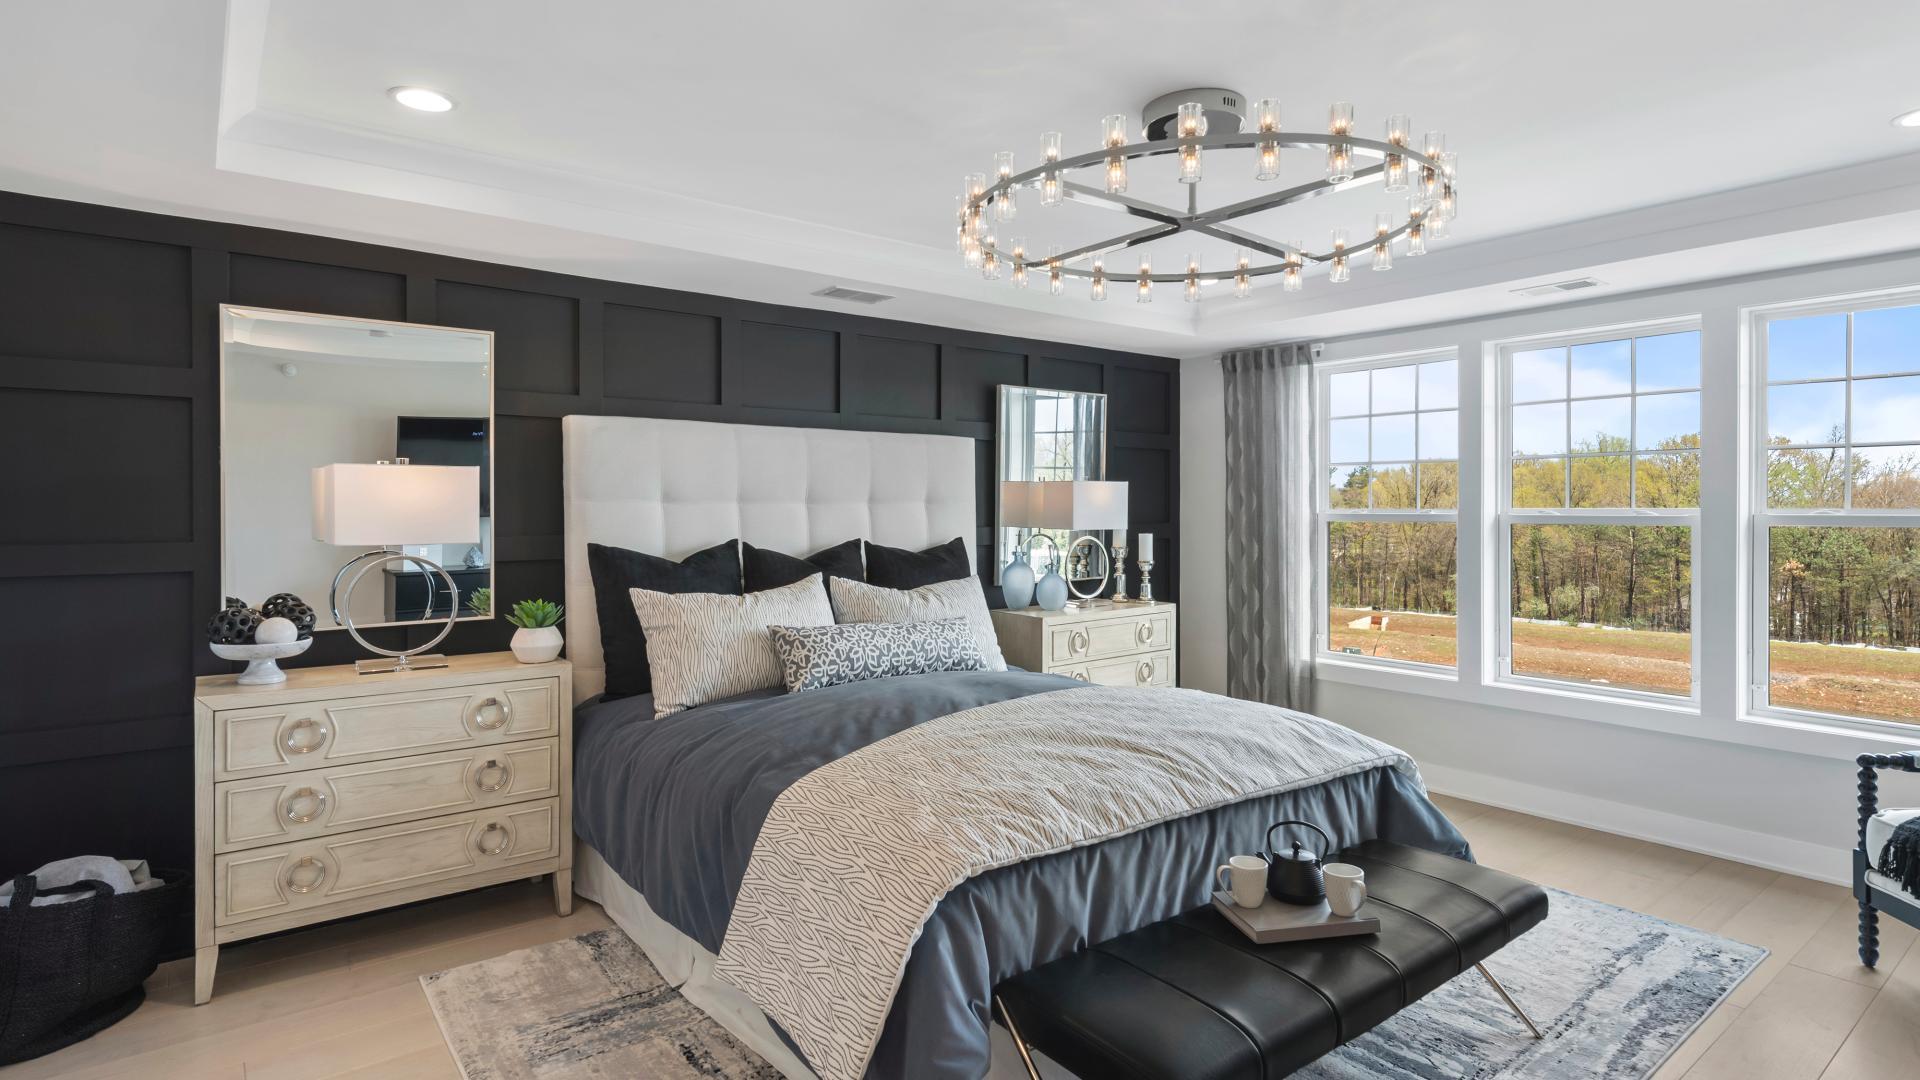 Luxury primary bedroom suite designs